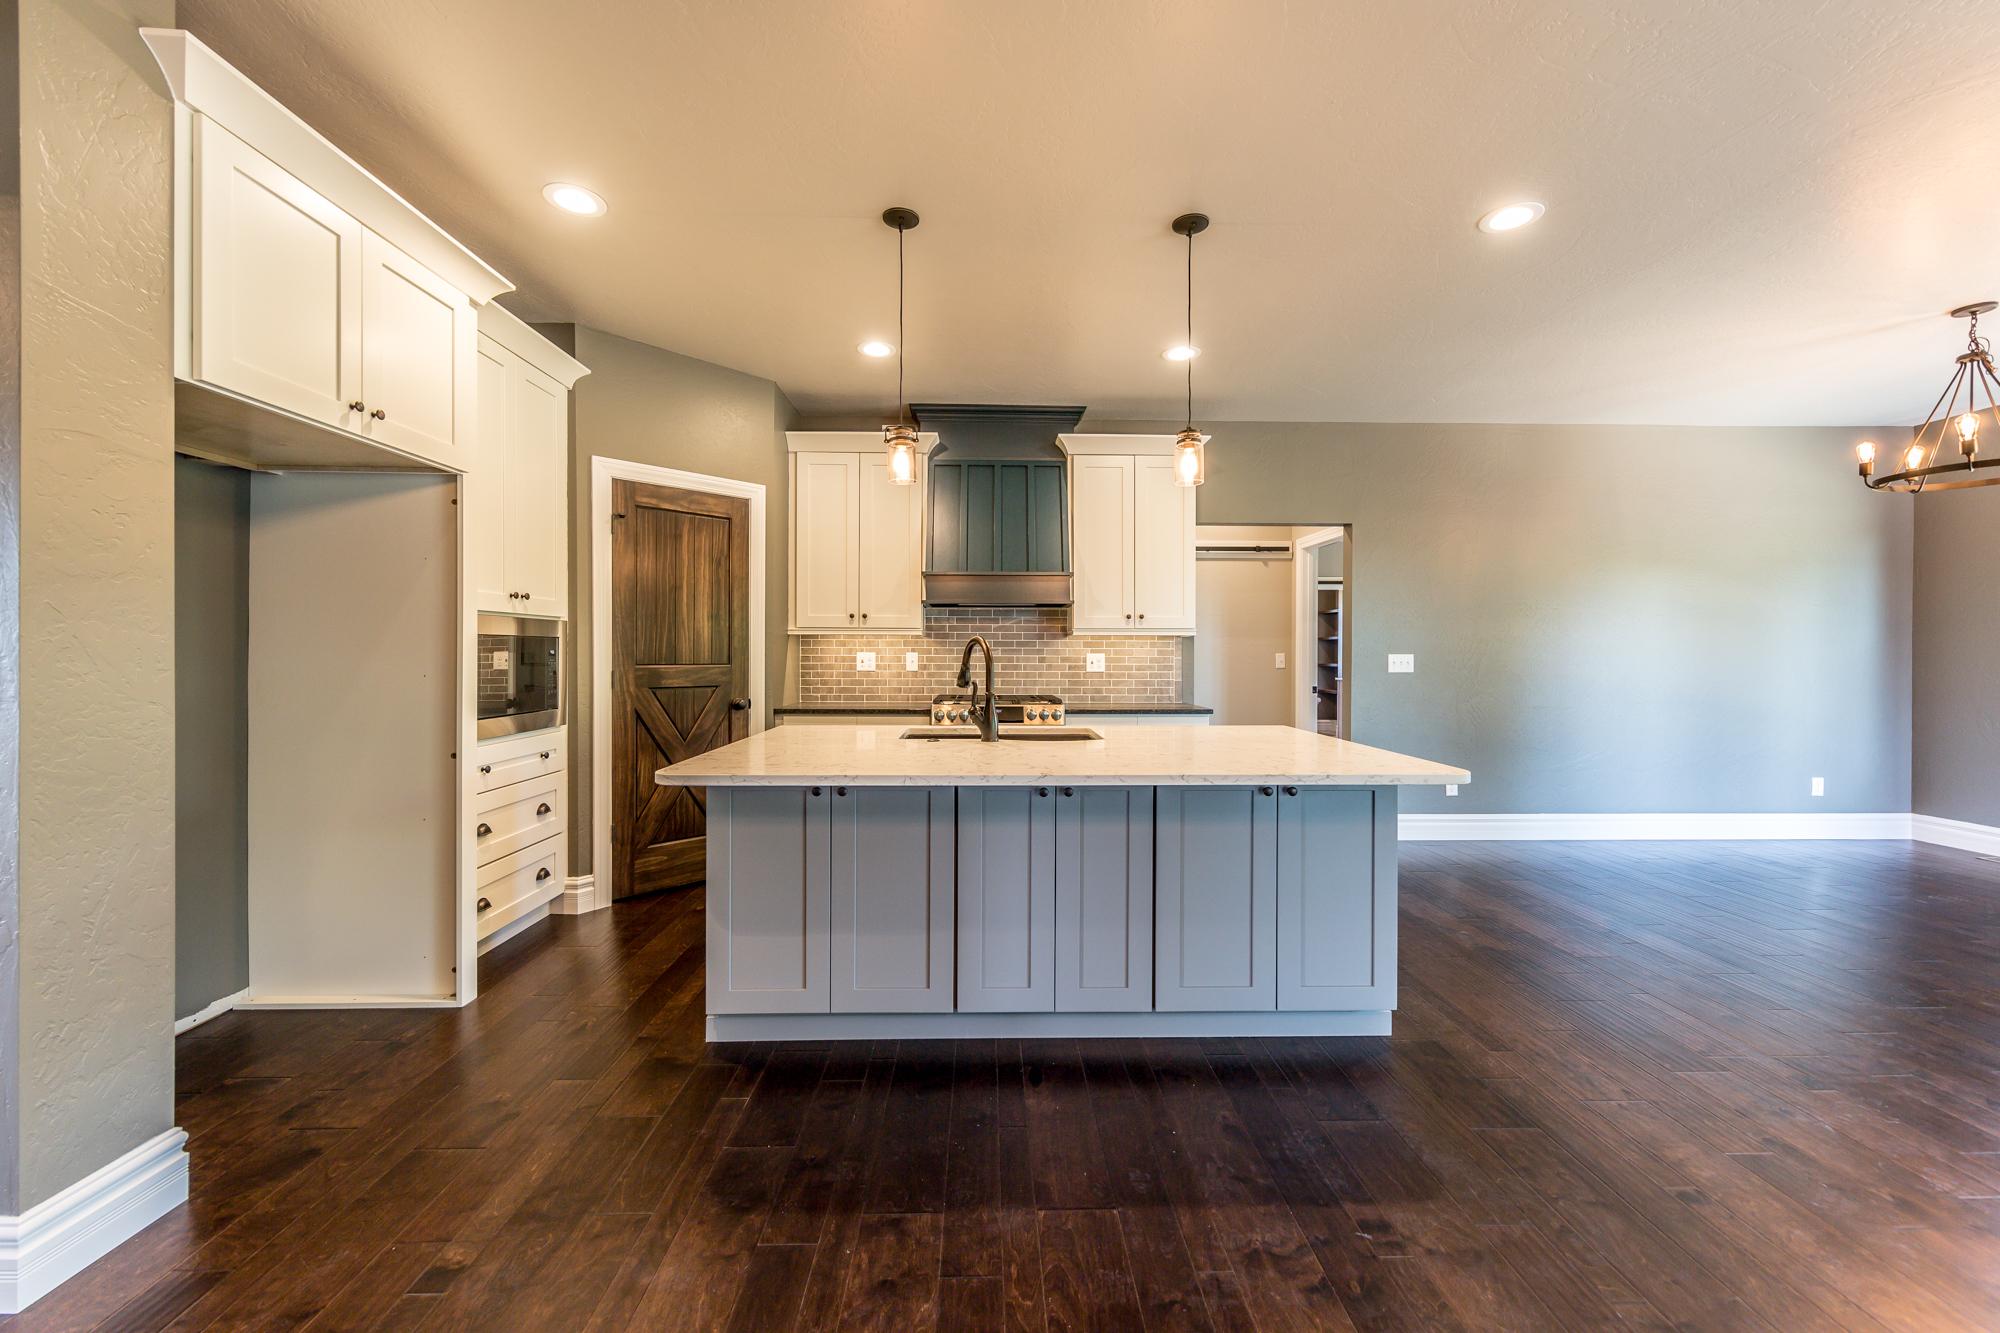 Home_For_Sale_O'Fallon_Illinois_Scott_AFB_CR_Holland-9.jpg